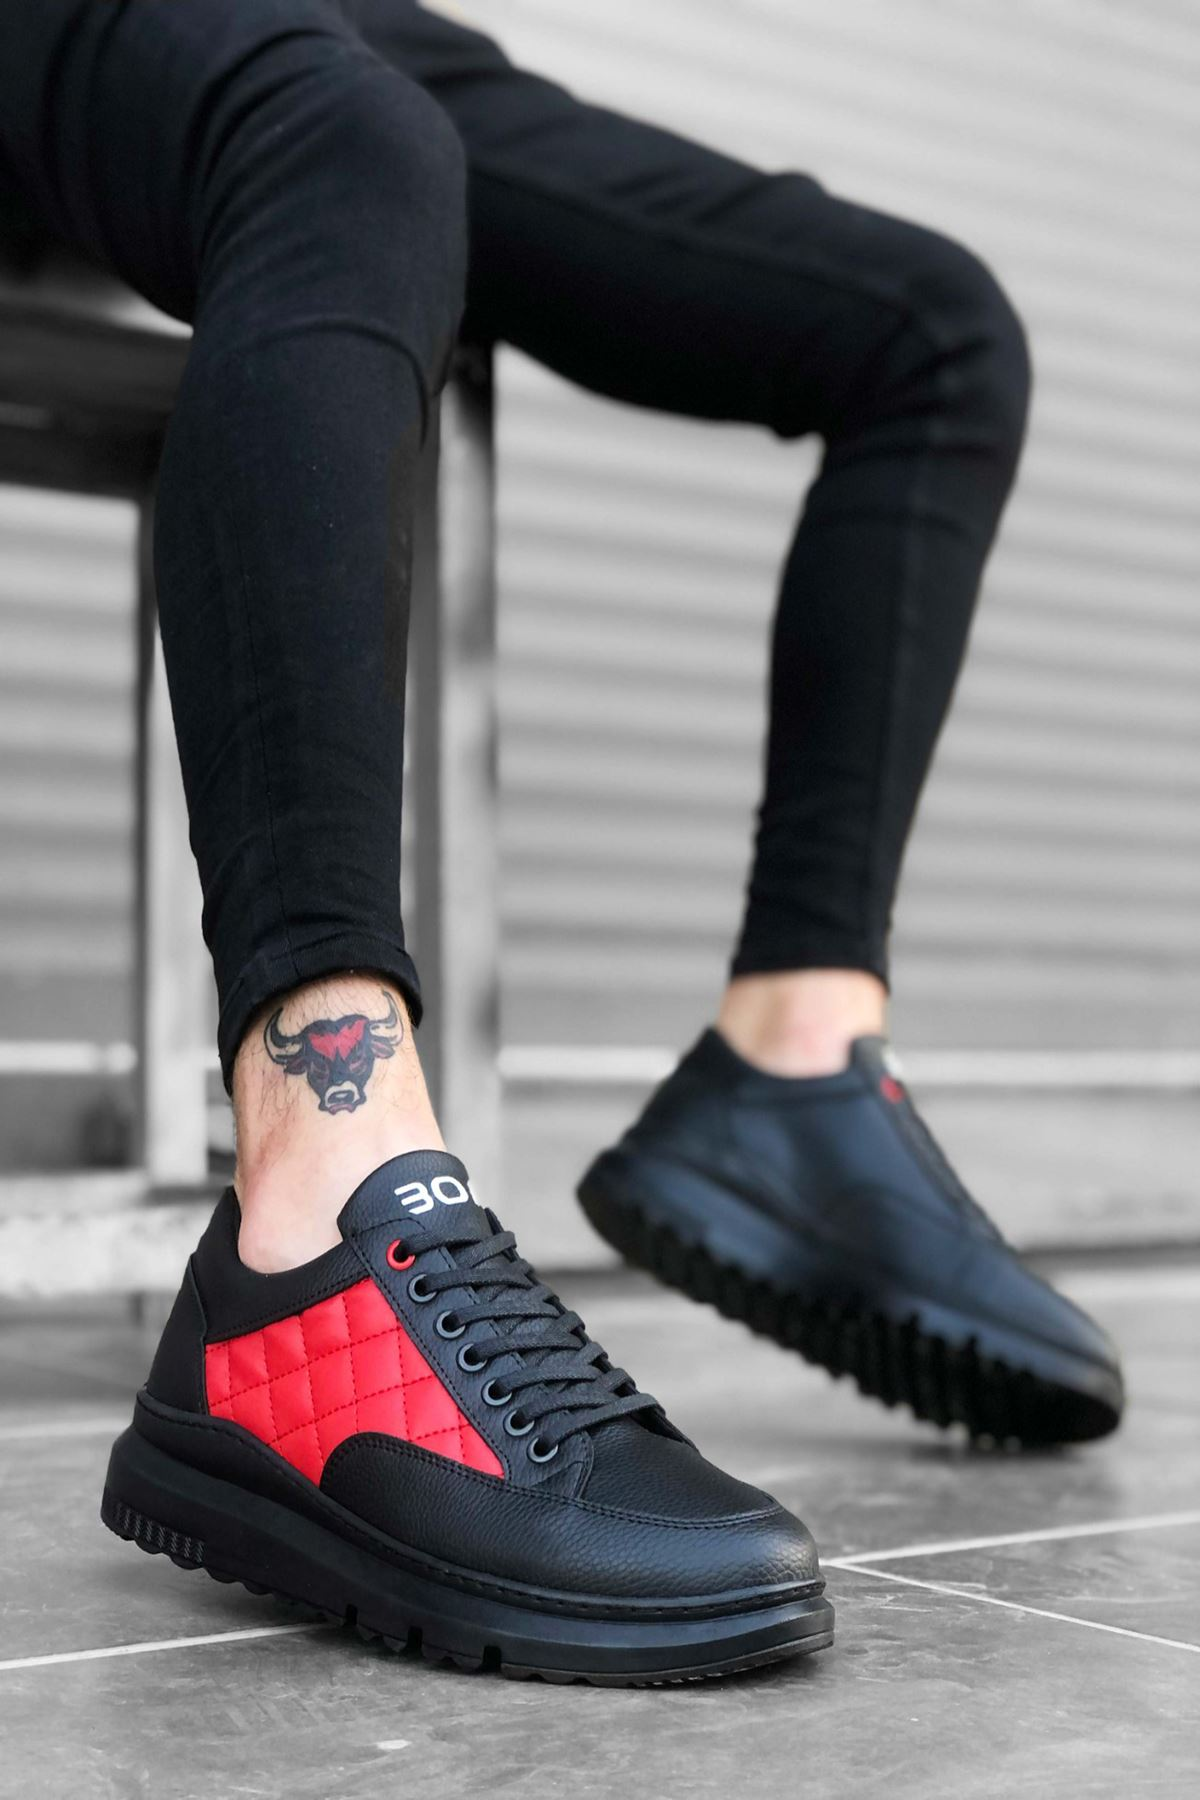 B180 Siyah Kırmızı ST Bağcıklı Erkek Sneakers